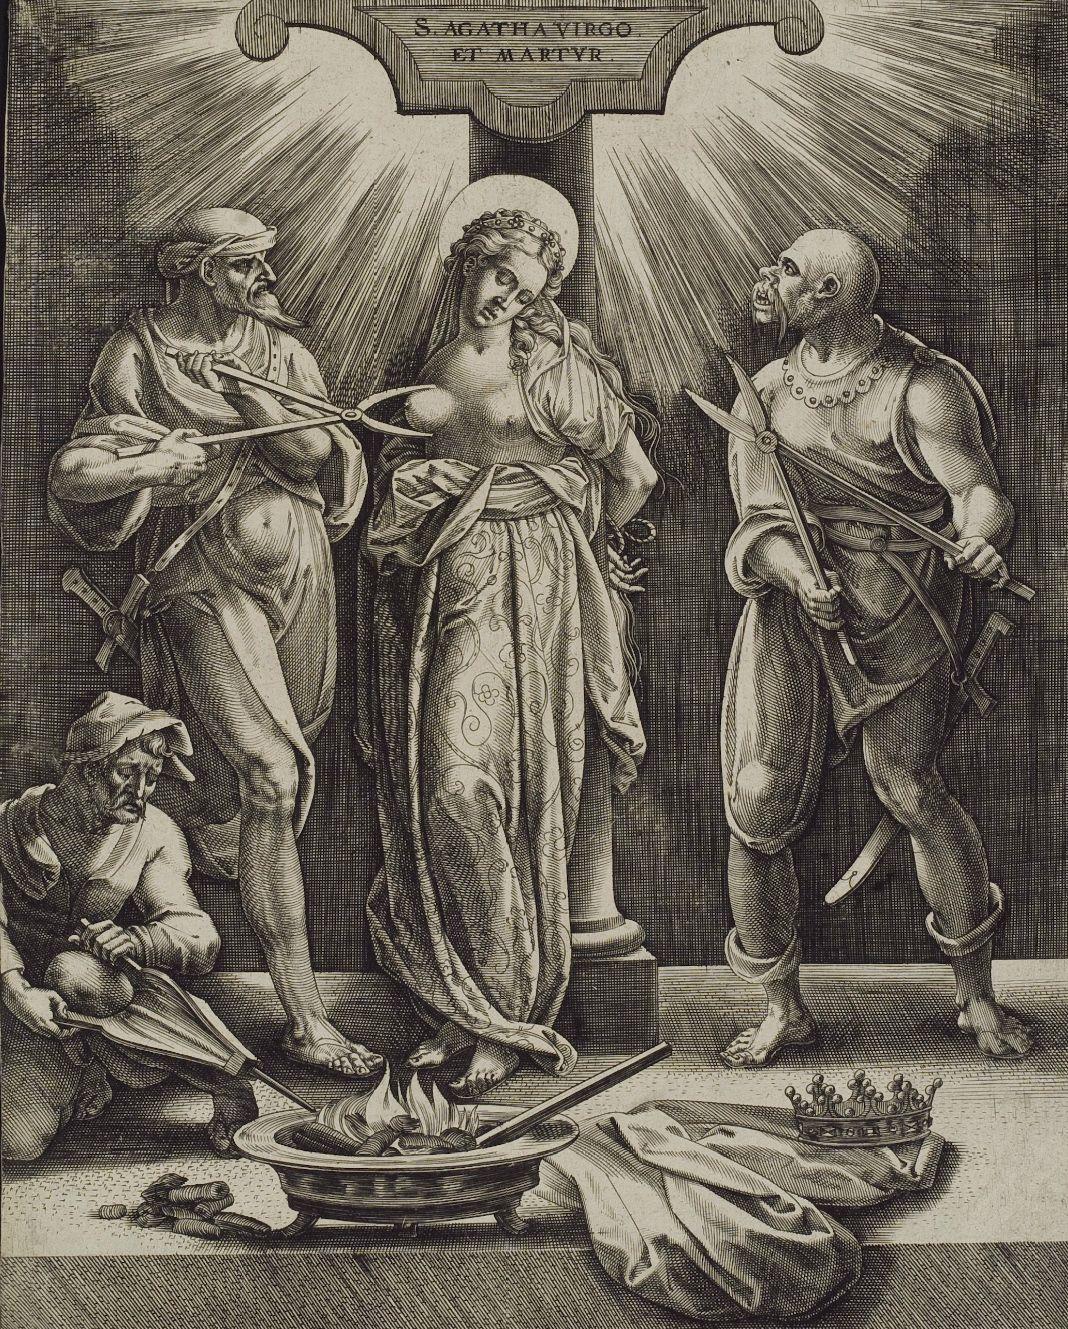 ART OF BELGIUM : Photo | Saint agatha, Art, Viking art